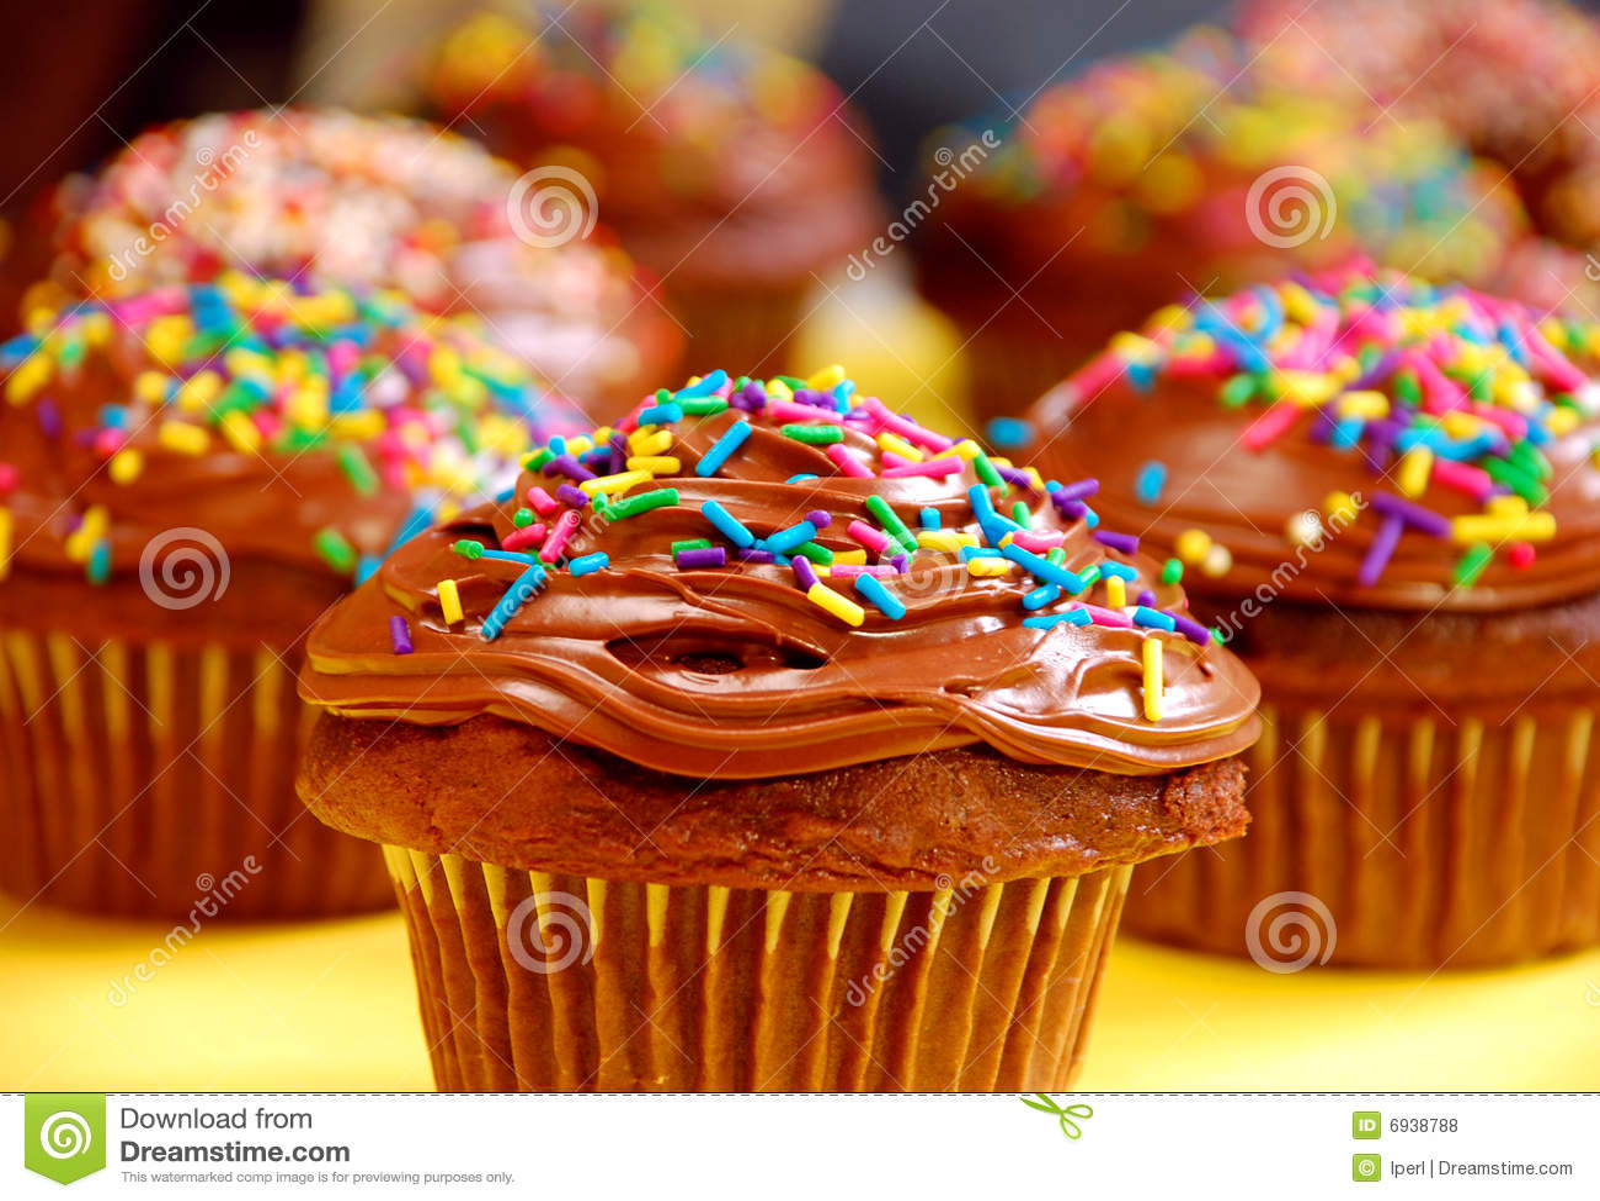 Chocolate Cupcakes Stock Photo Image Of Baked Cupcakes 6938788